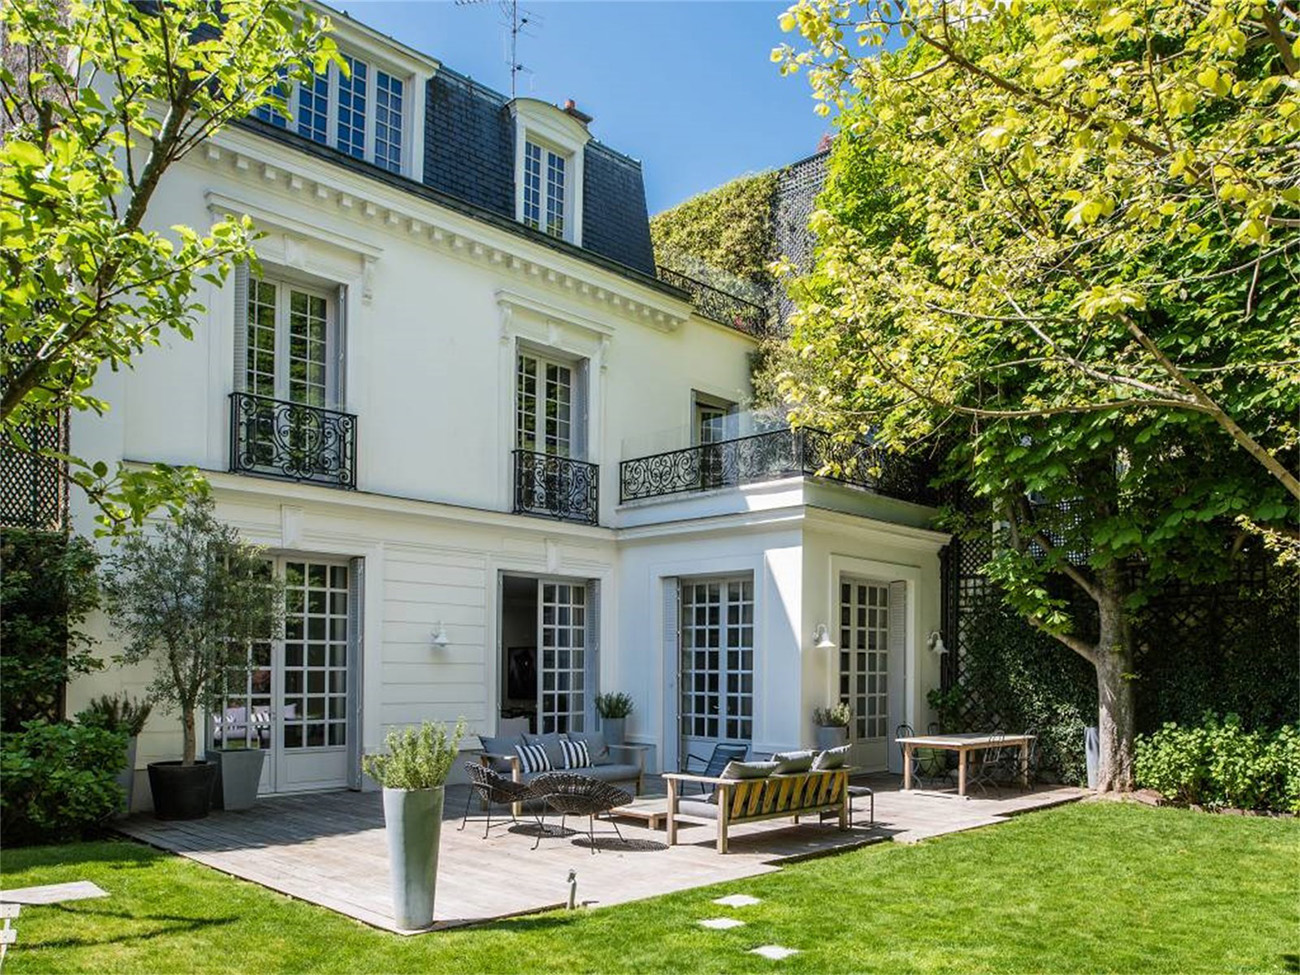 Home in Auteuil, Paris - Exterior